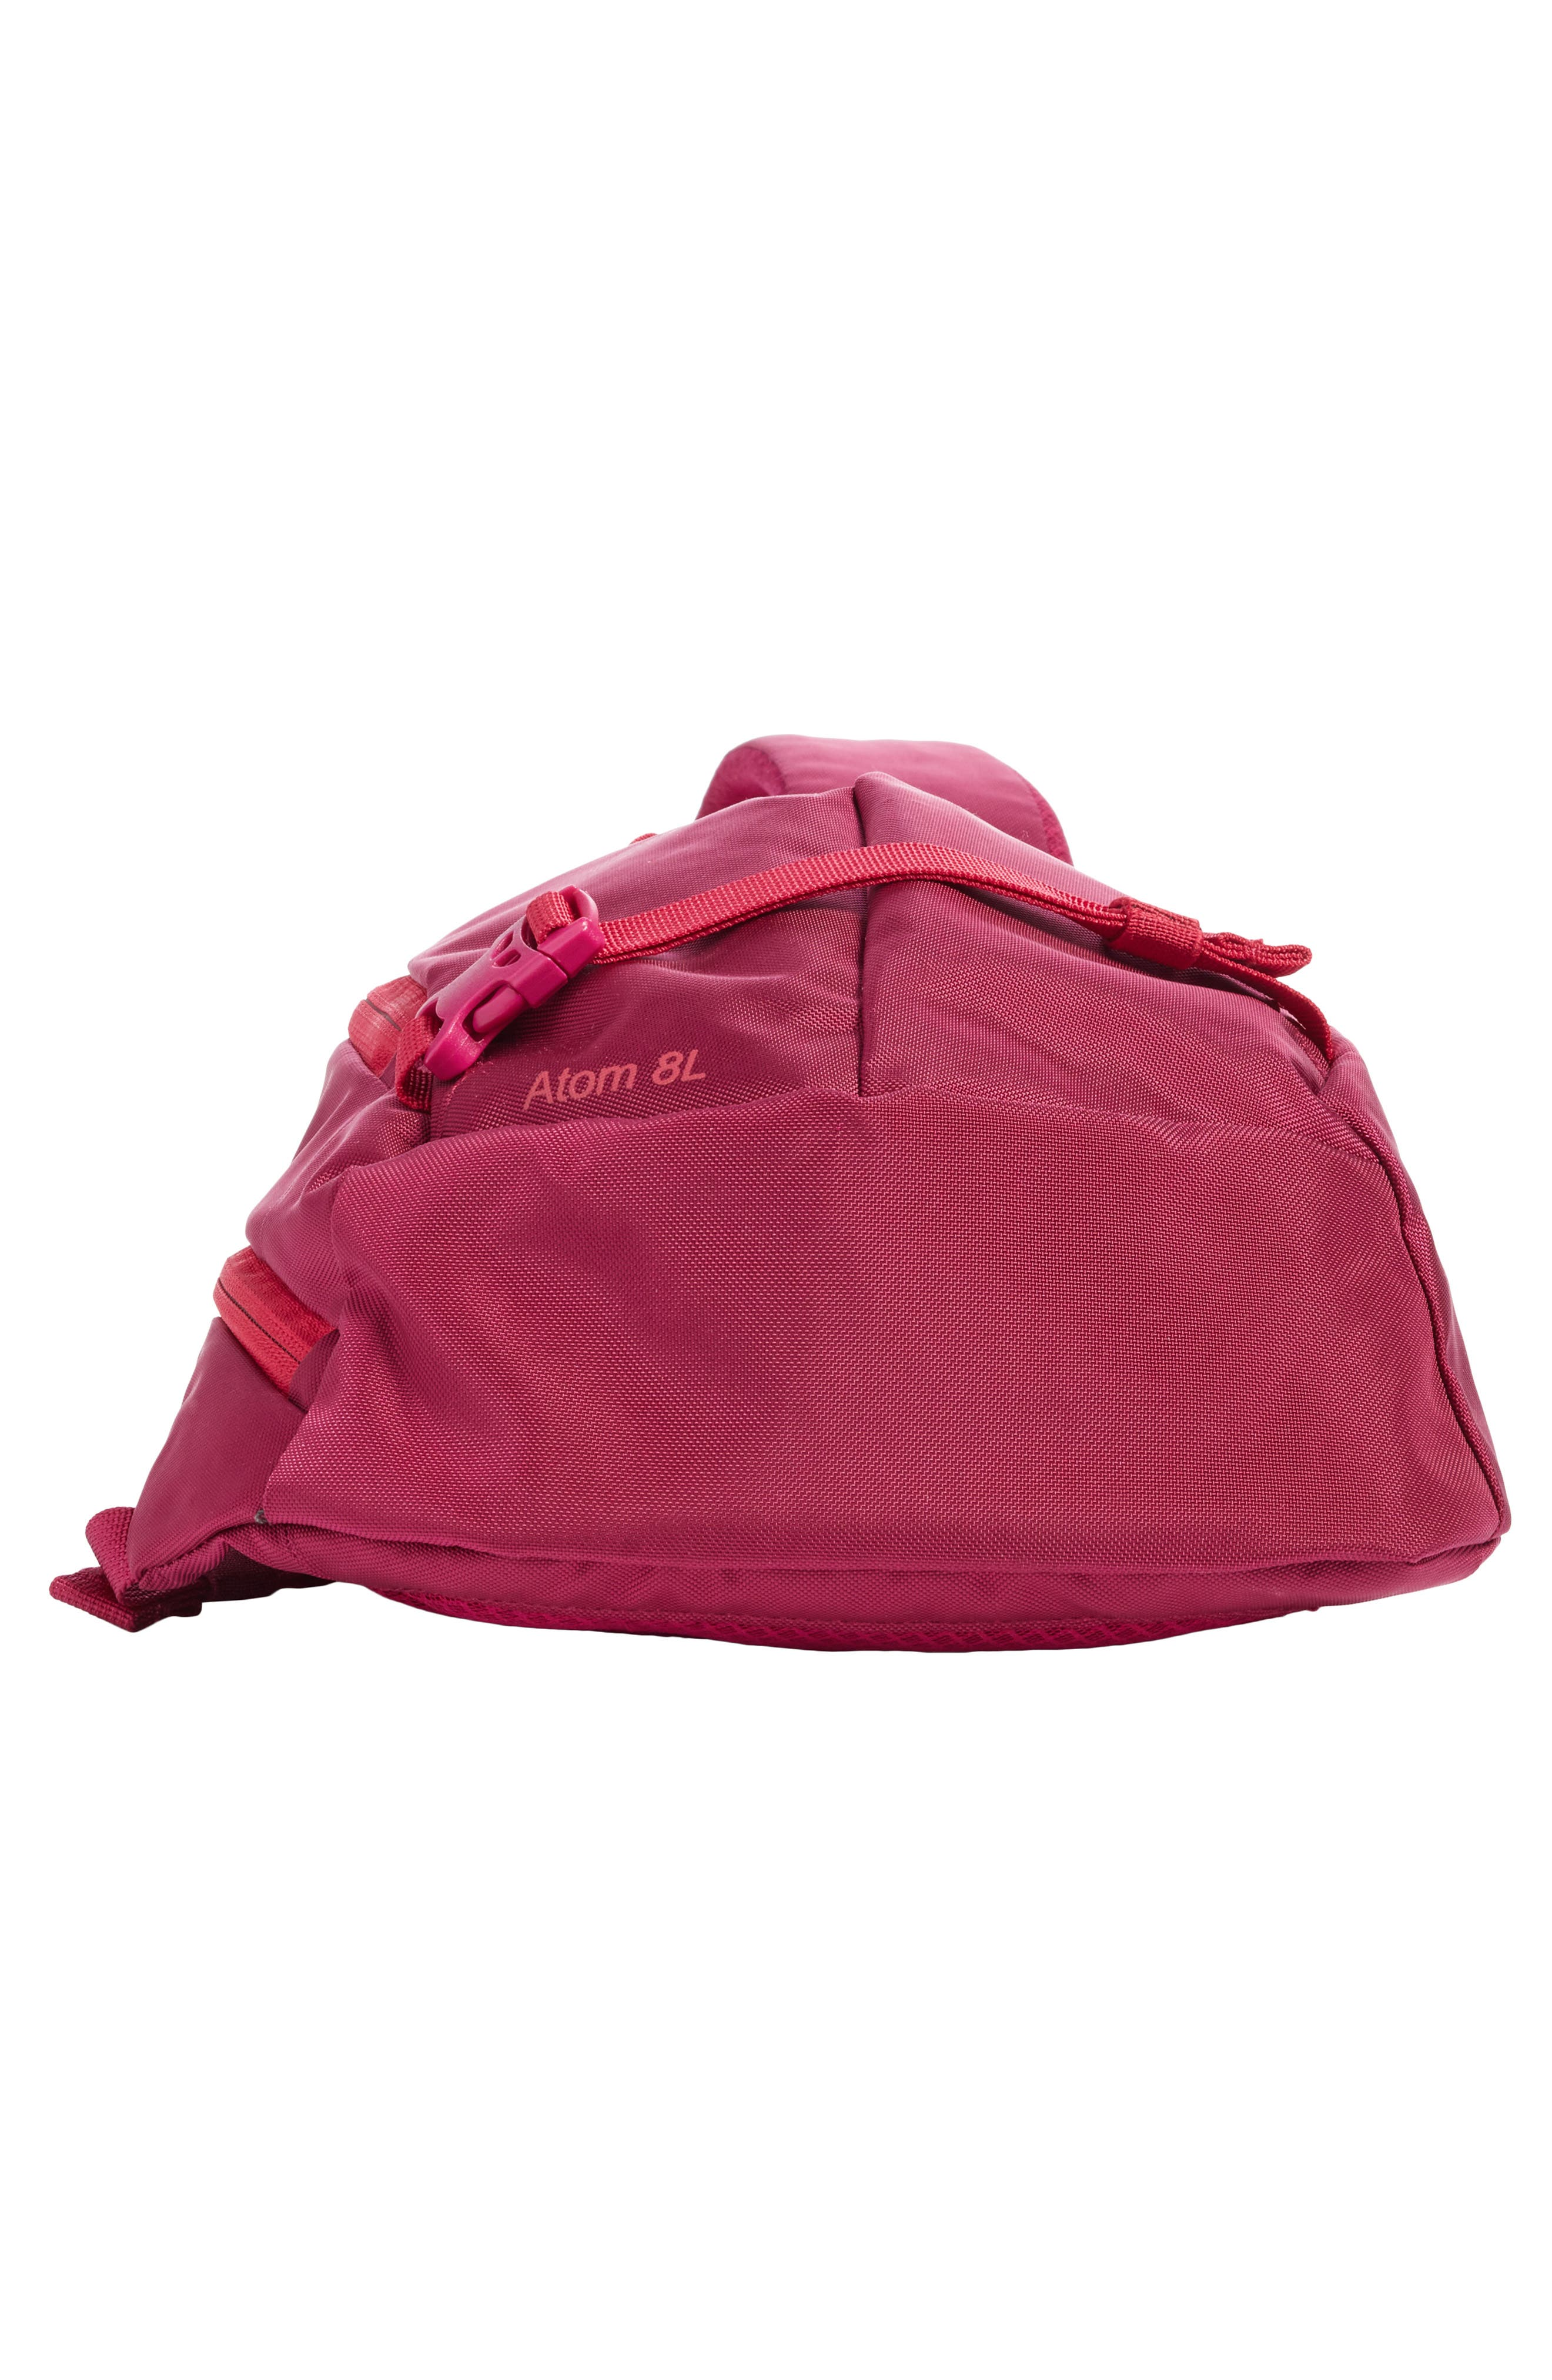 Atom 8L Sling Backpack,                             Alternate thumbnail 6, color,                             Magenta